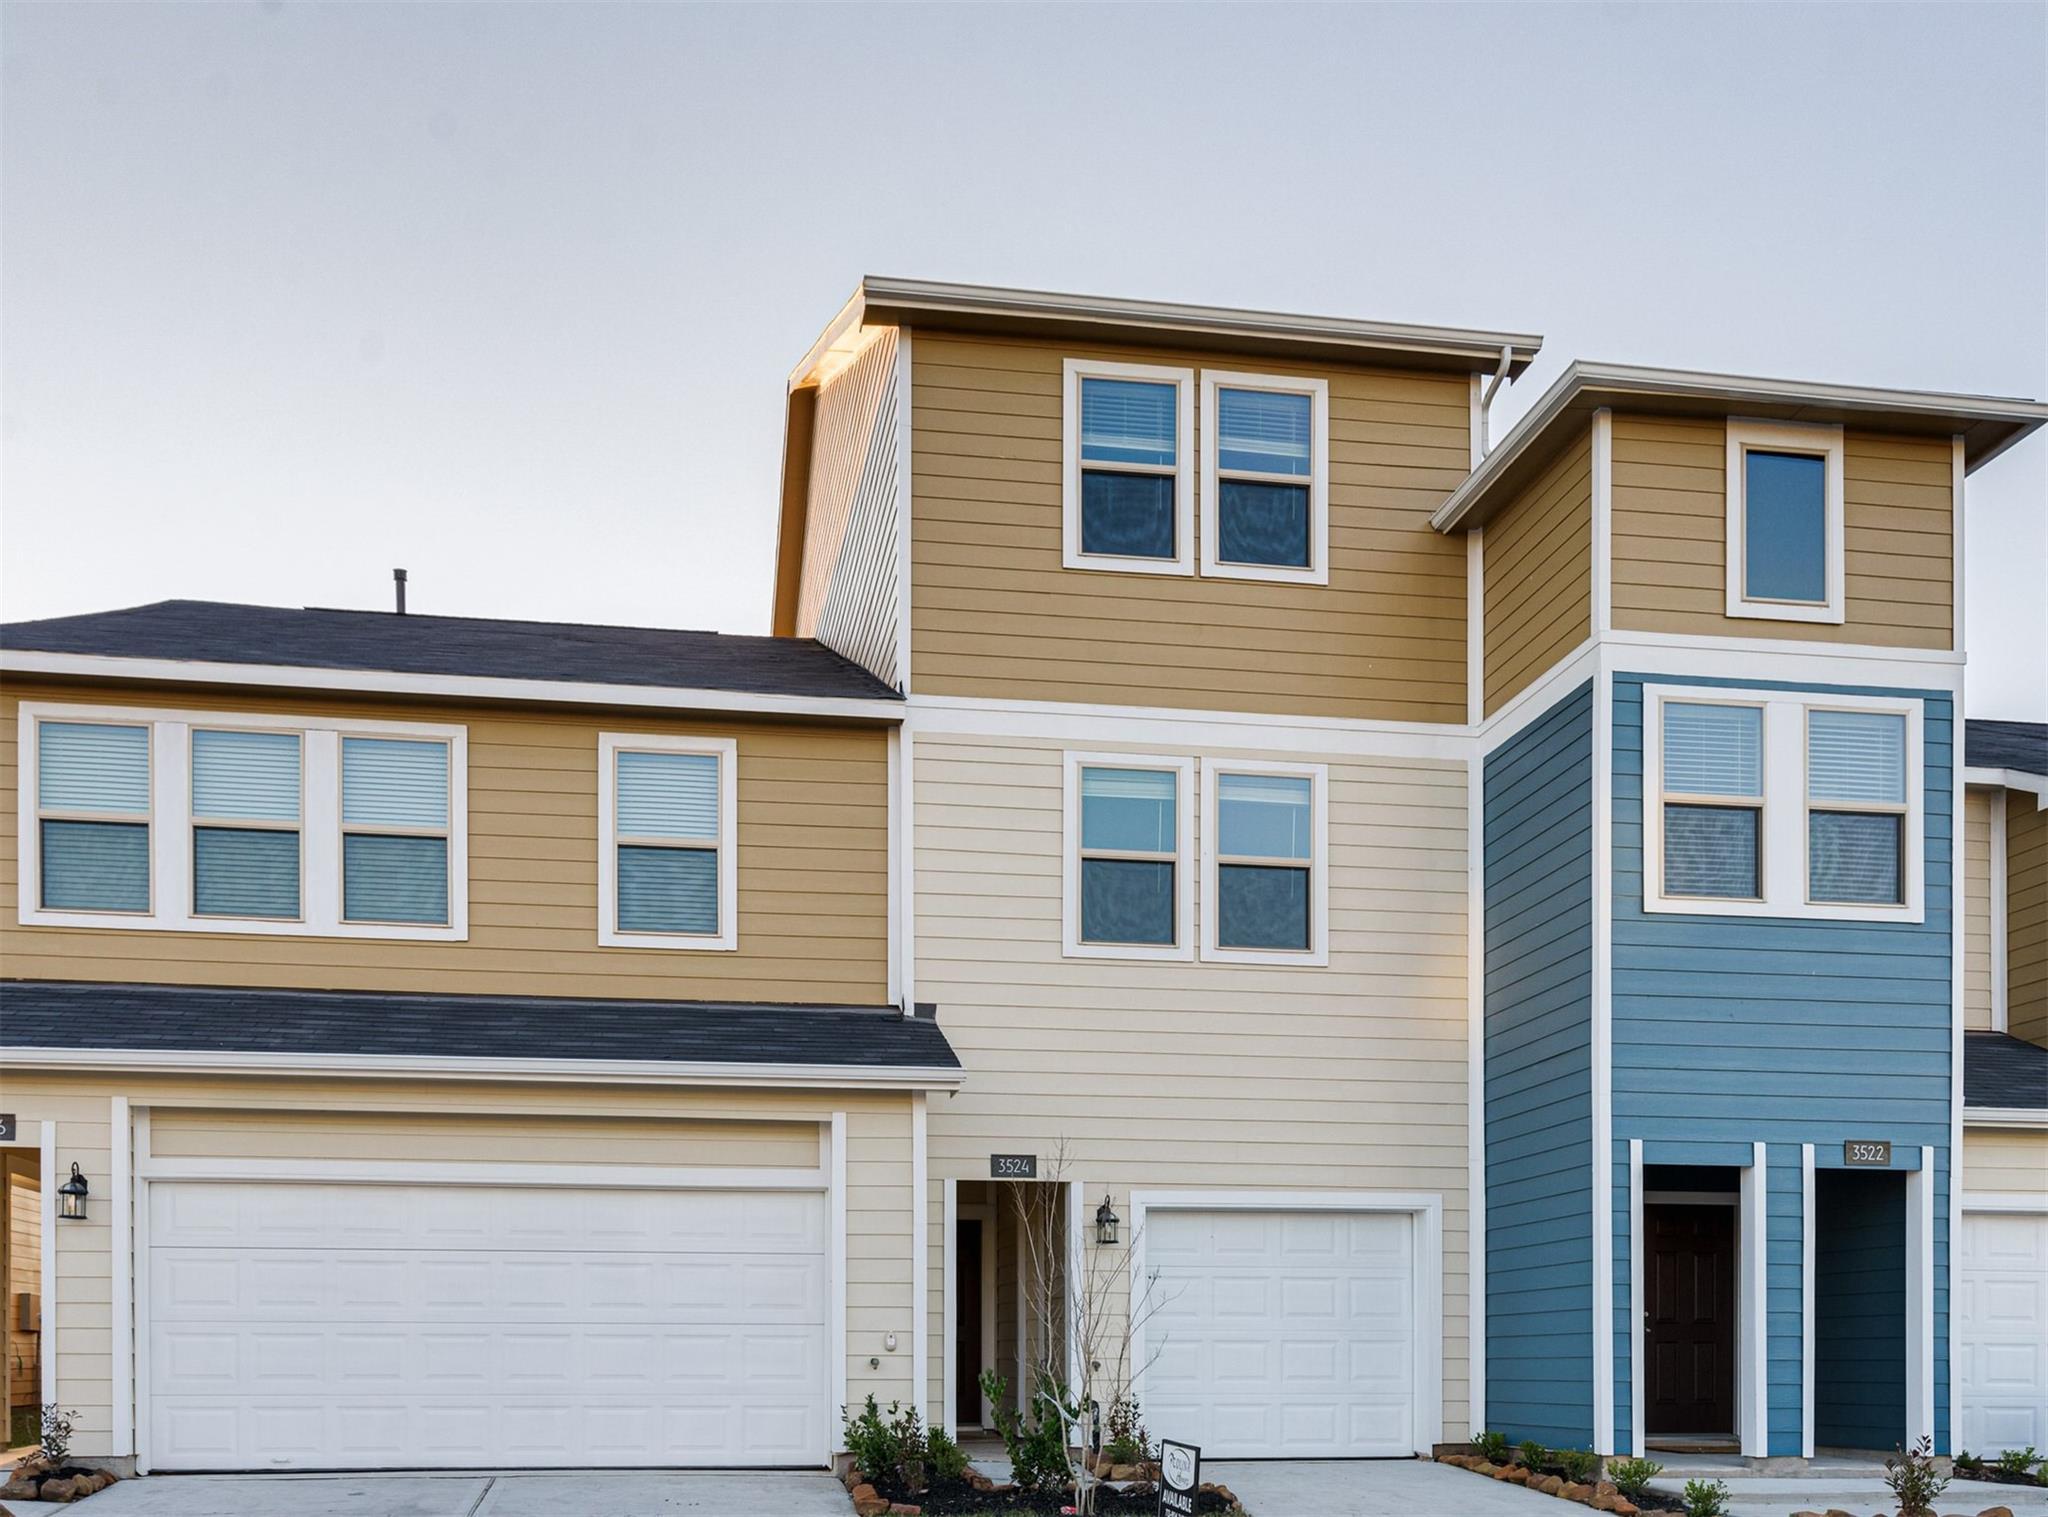 3606 Midway Lane Property Photo - Pasadena, TX real estate listing